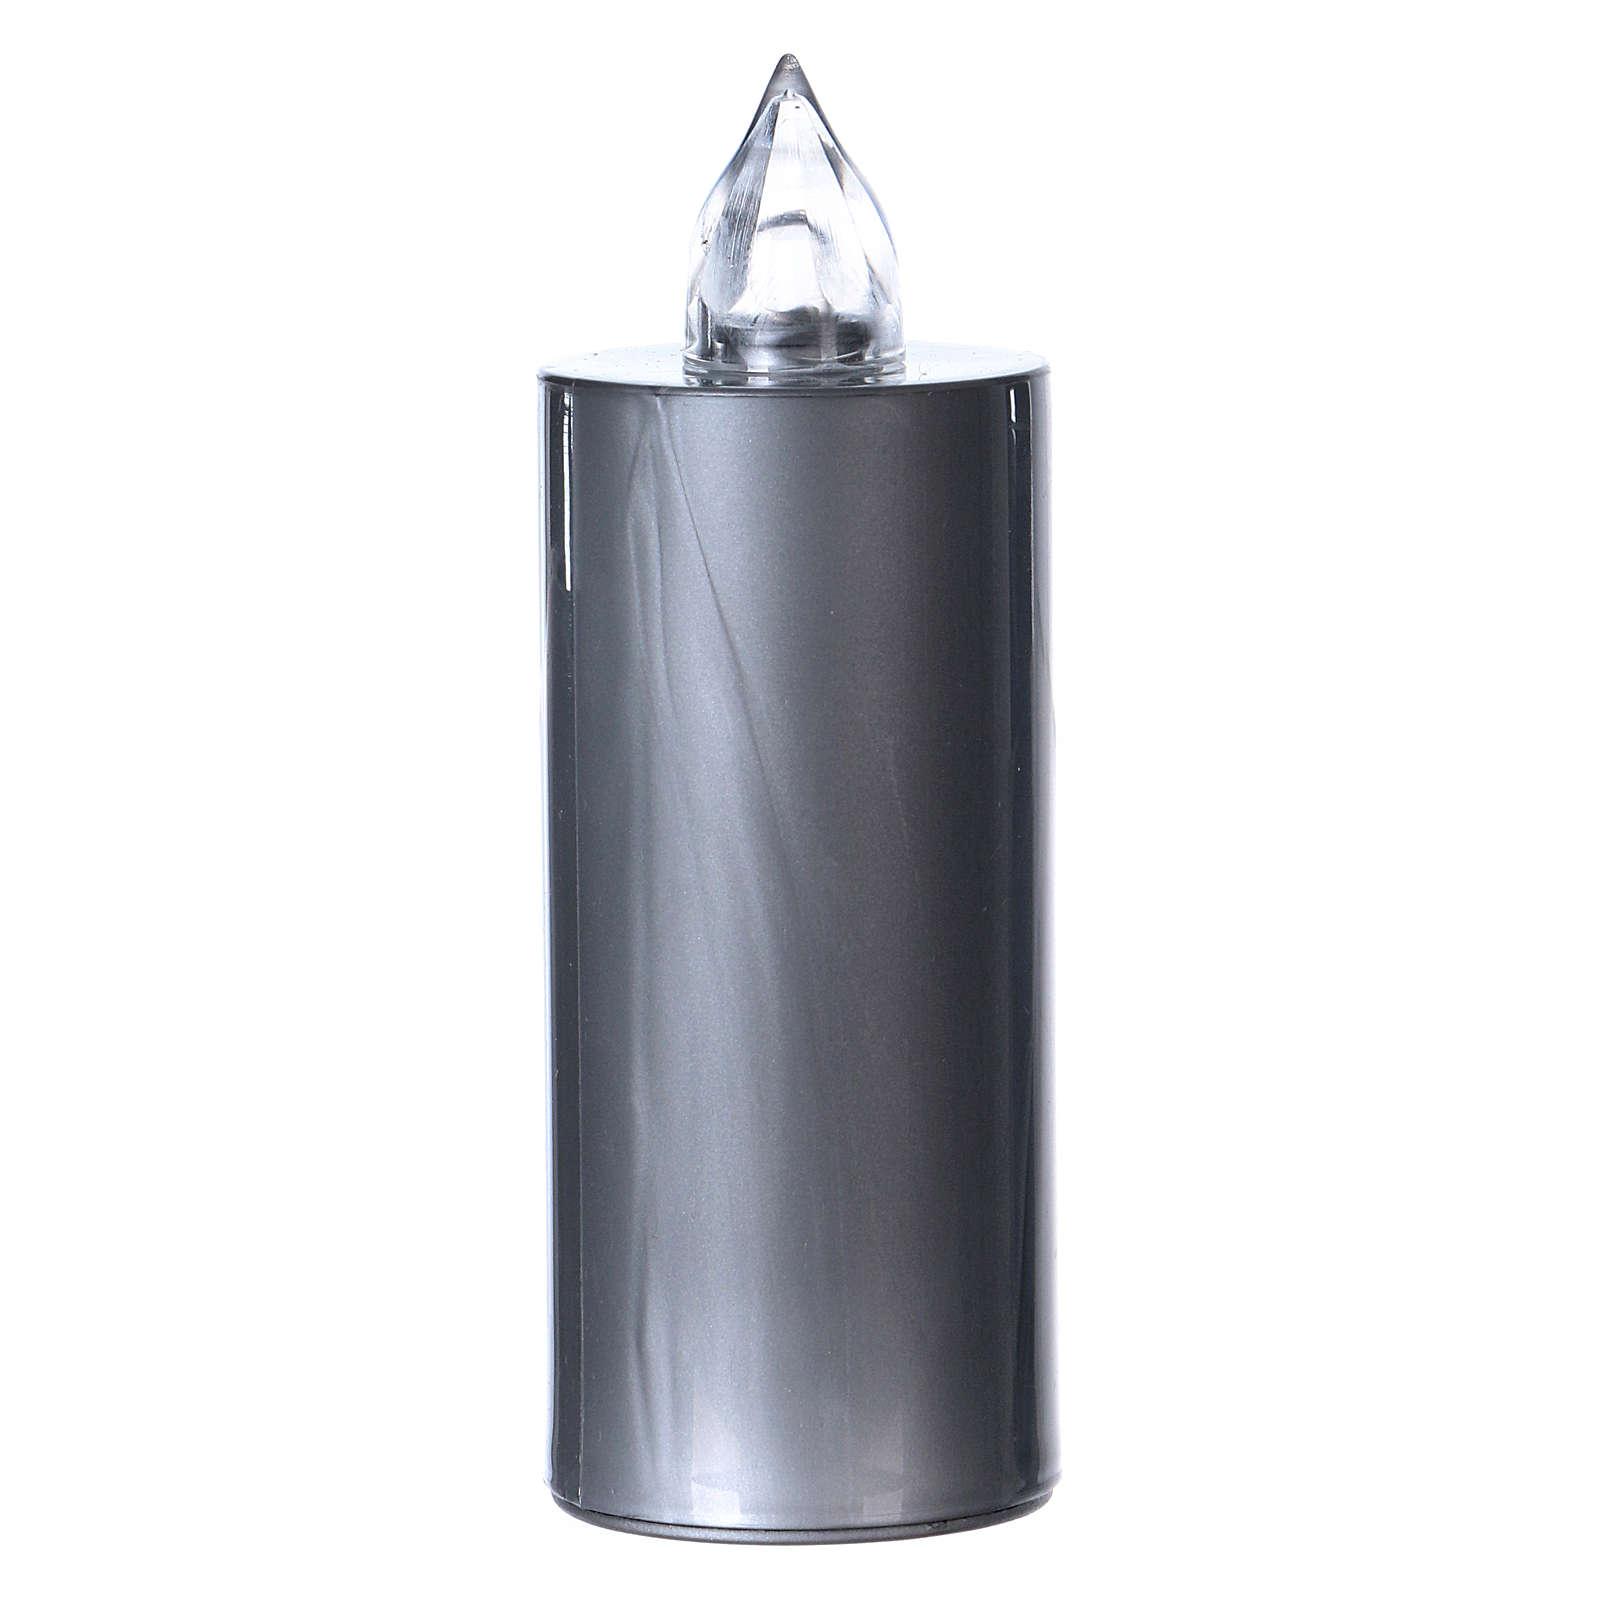 Lamparilla Lumada luz parpadeante blanca desechable plata 3